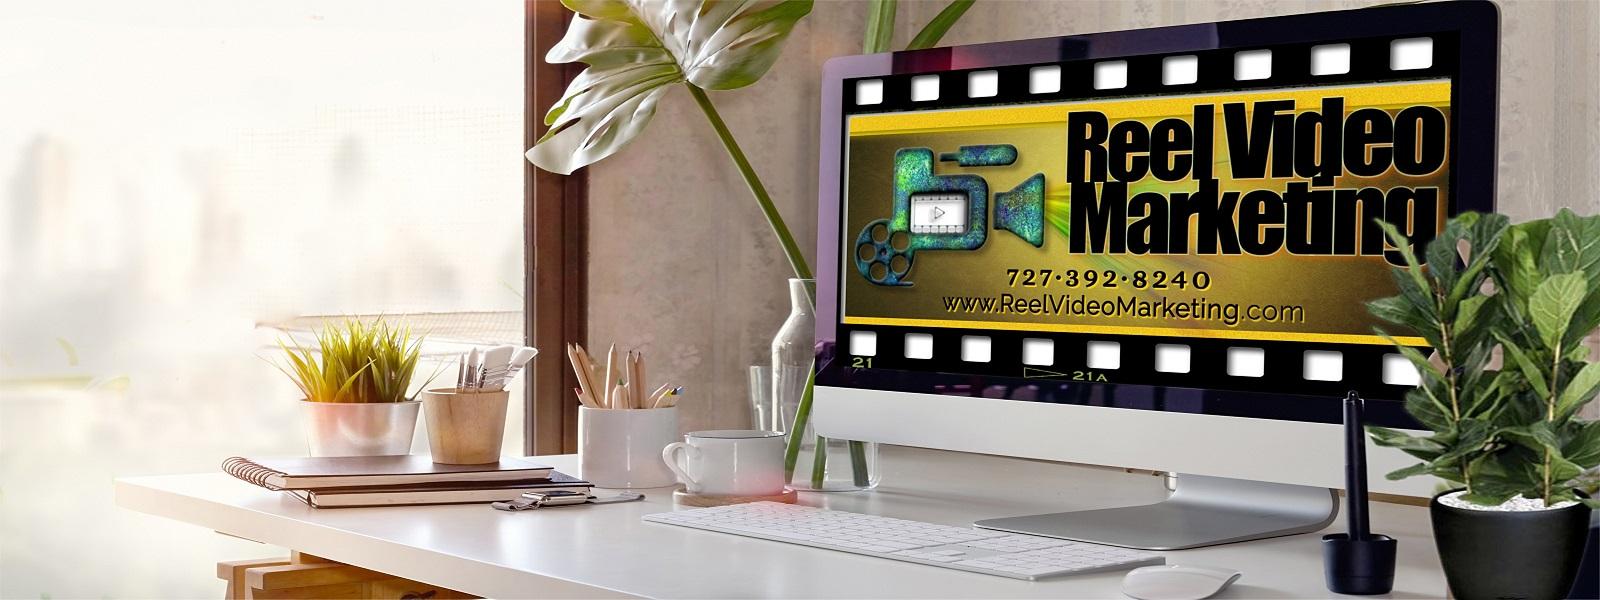 Home Page Slider Images